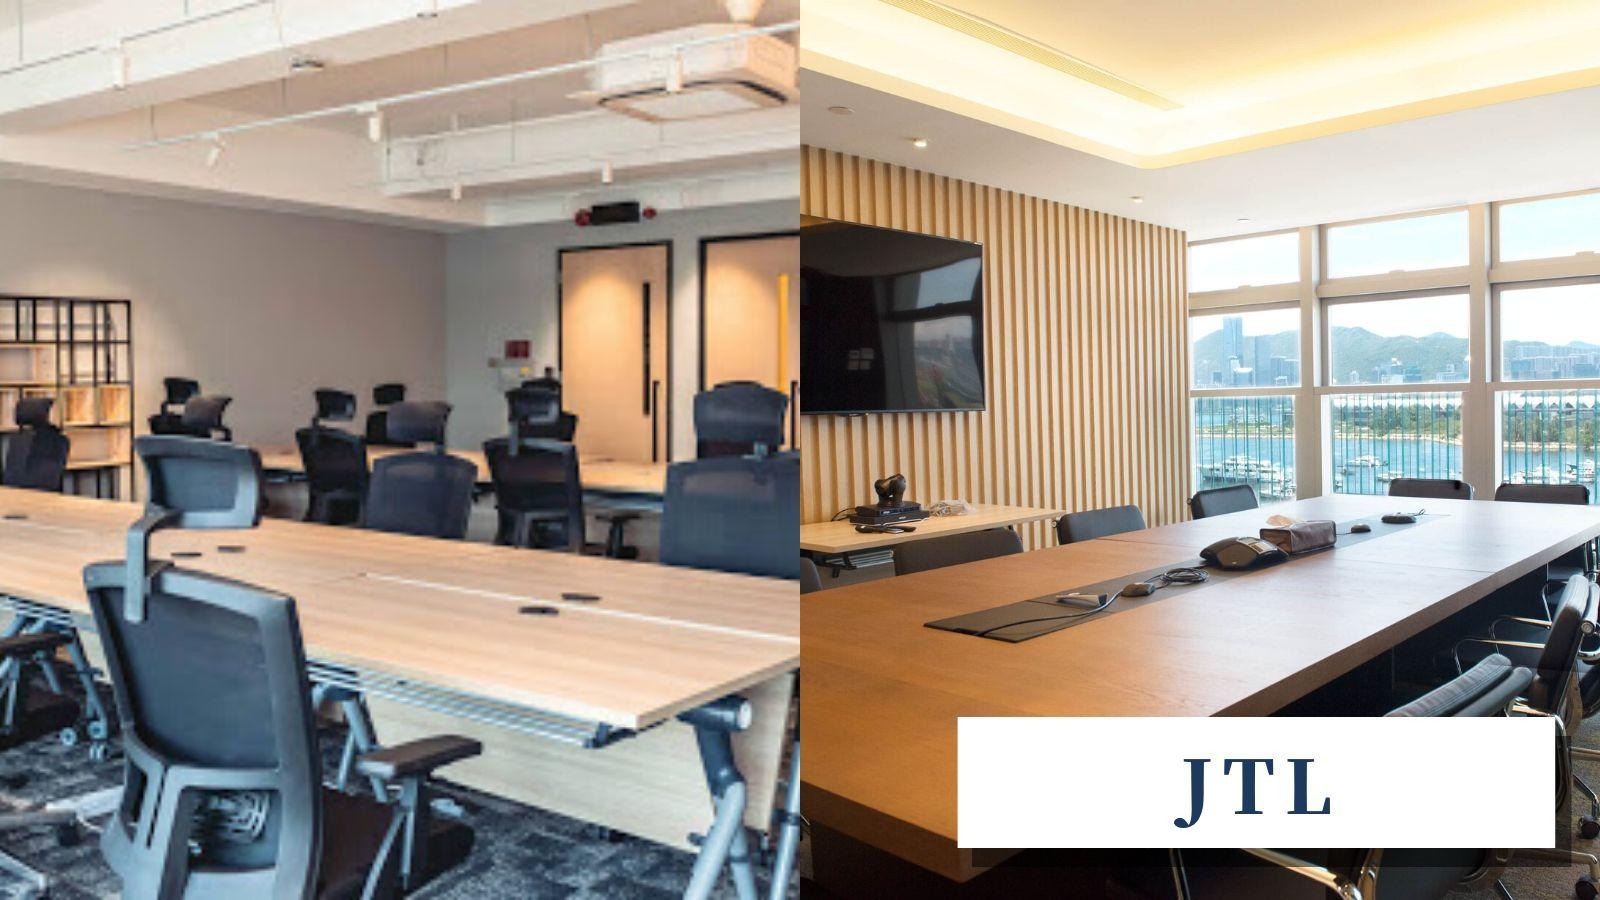 jtl coworking center